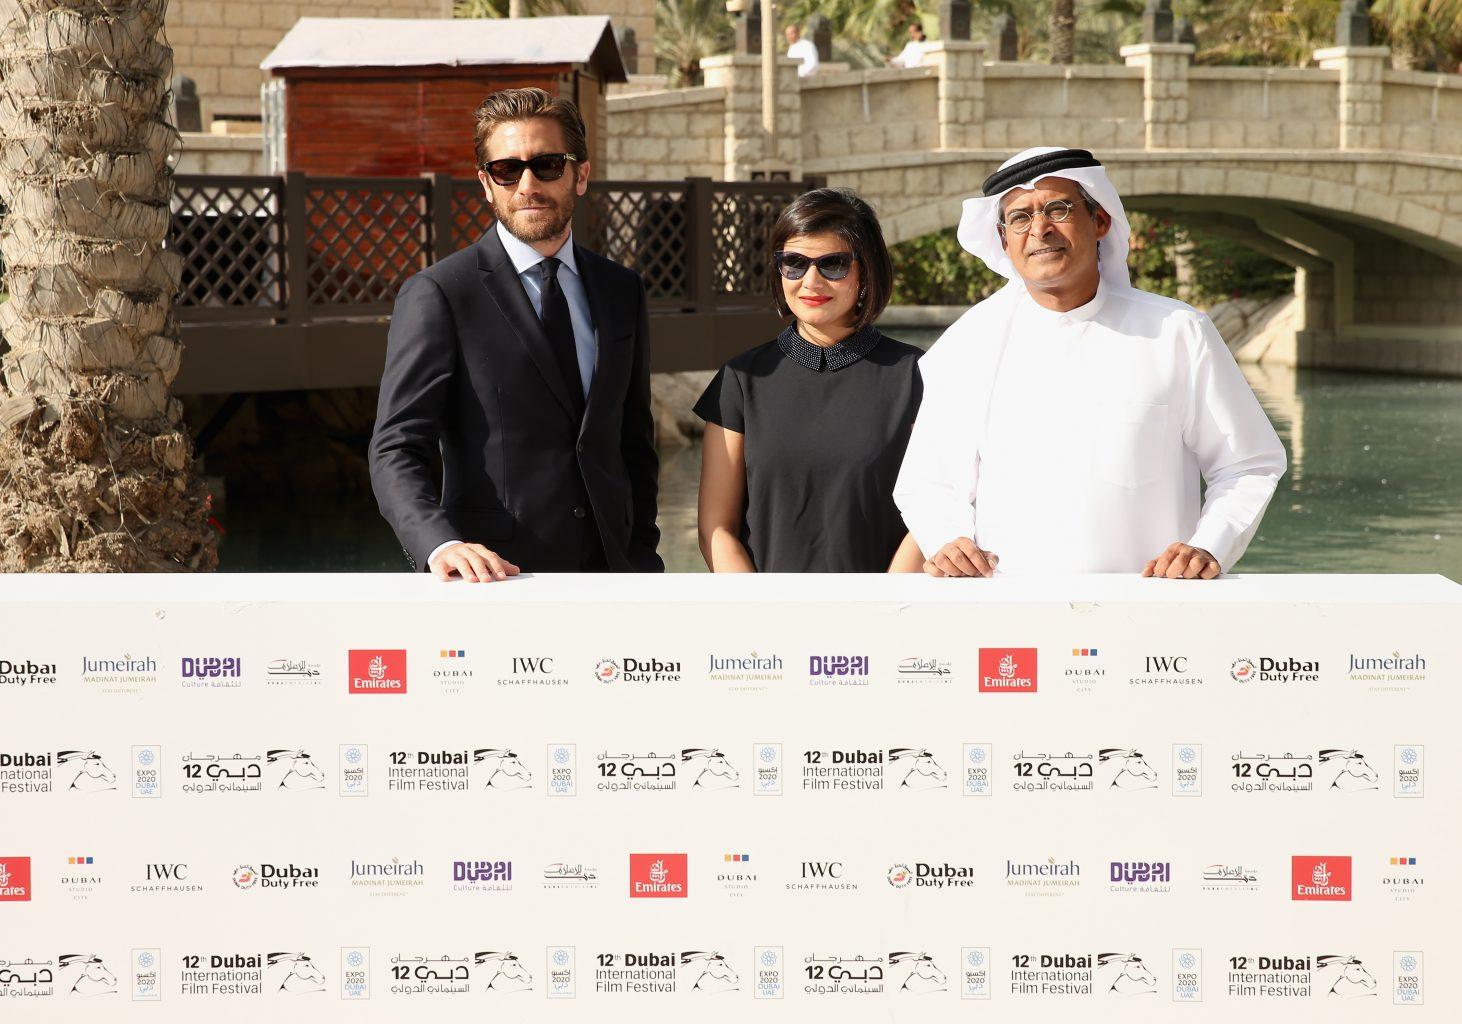 Da Cate Blanchett a Sarah Jessica Parker: tutte le dive al Dubai International Film Festival